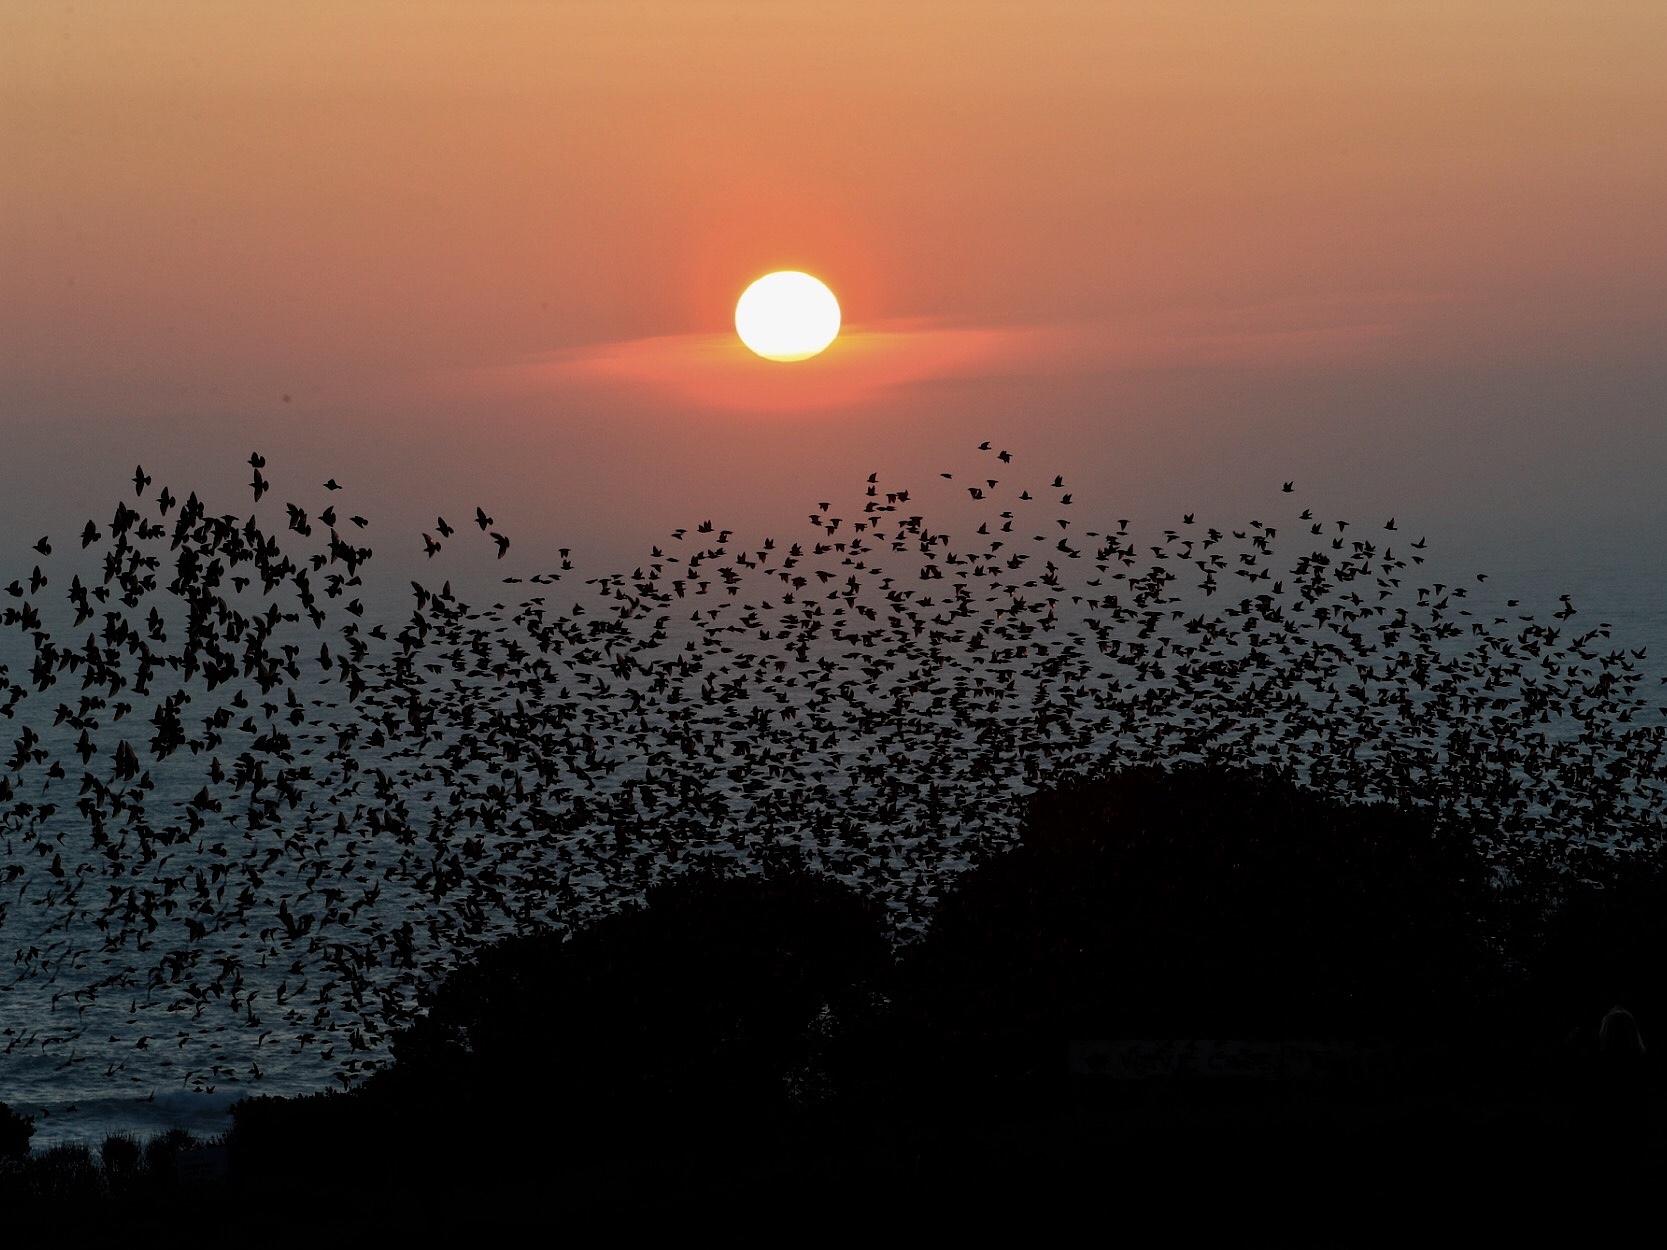 Starlings lizard